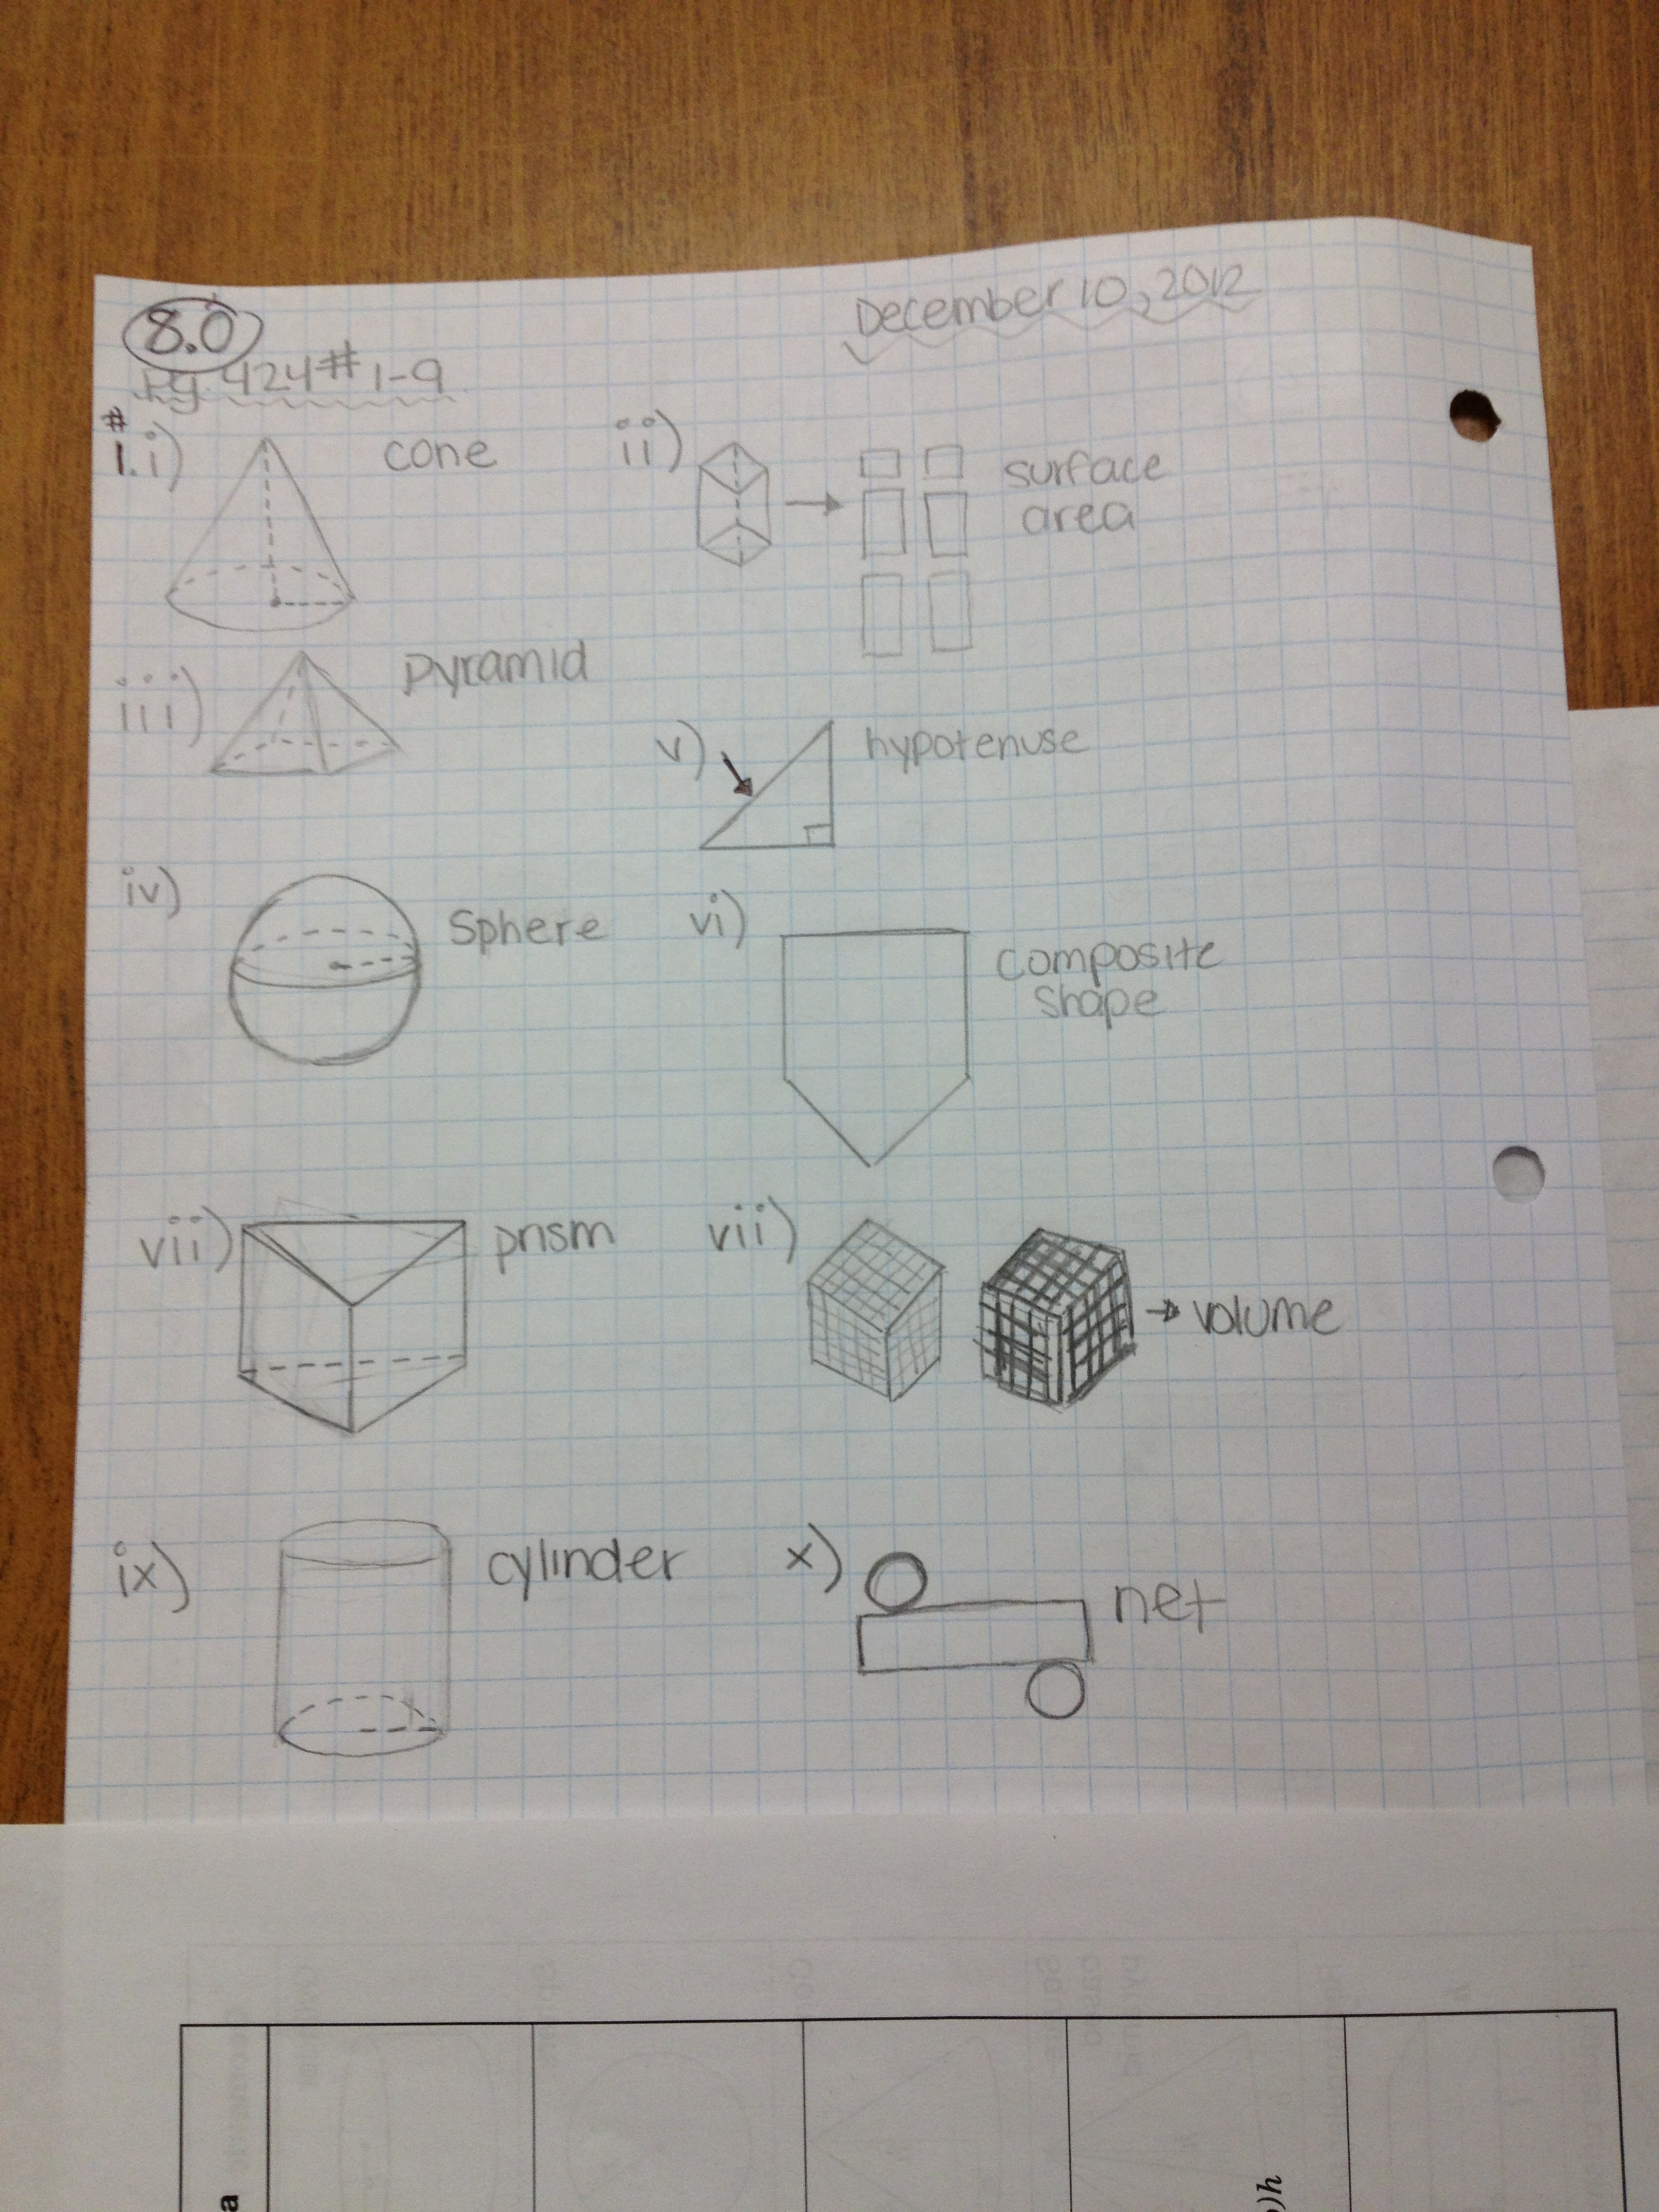 Needmathhelp Grade 9 Mathematics The Path Is Full Of Numbers